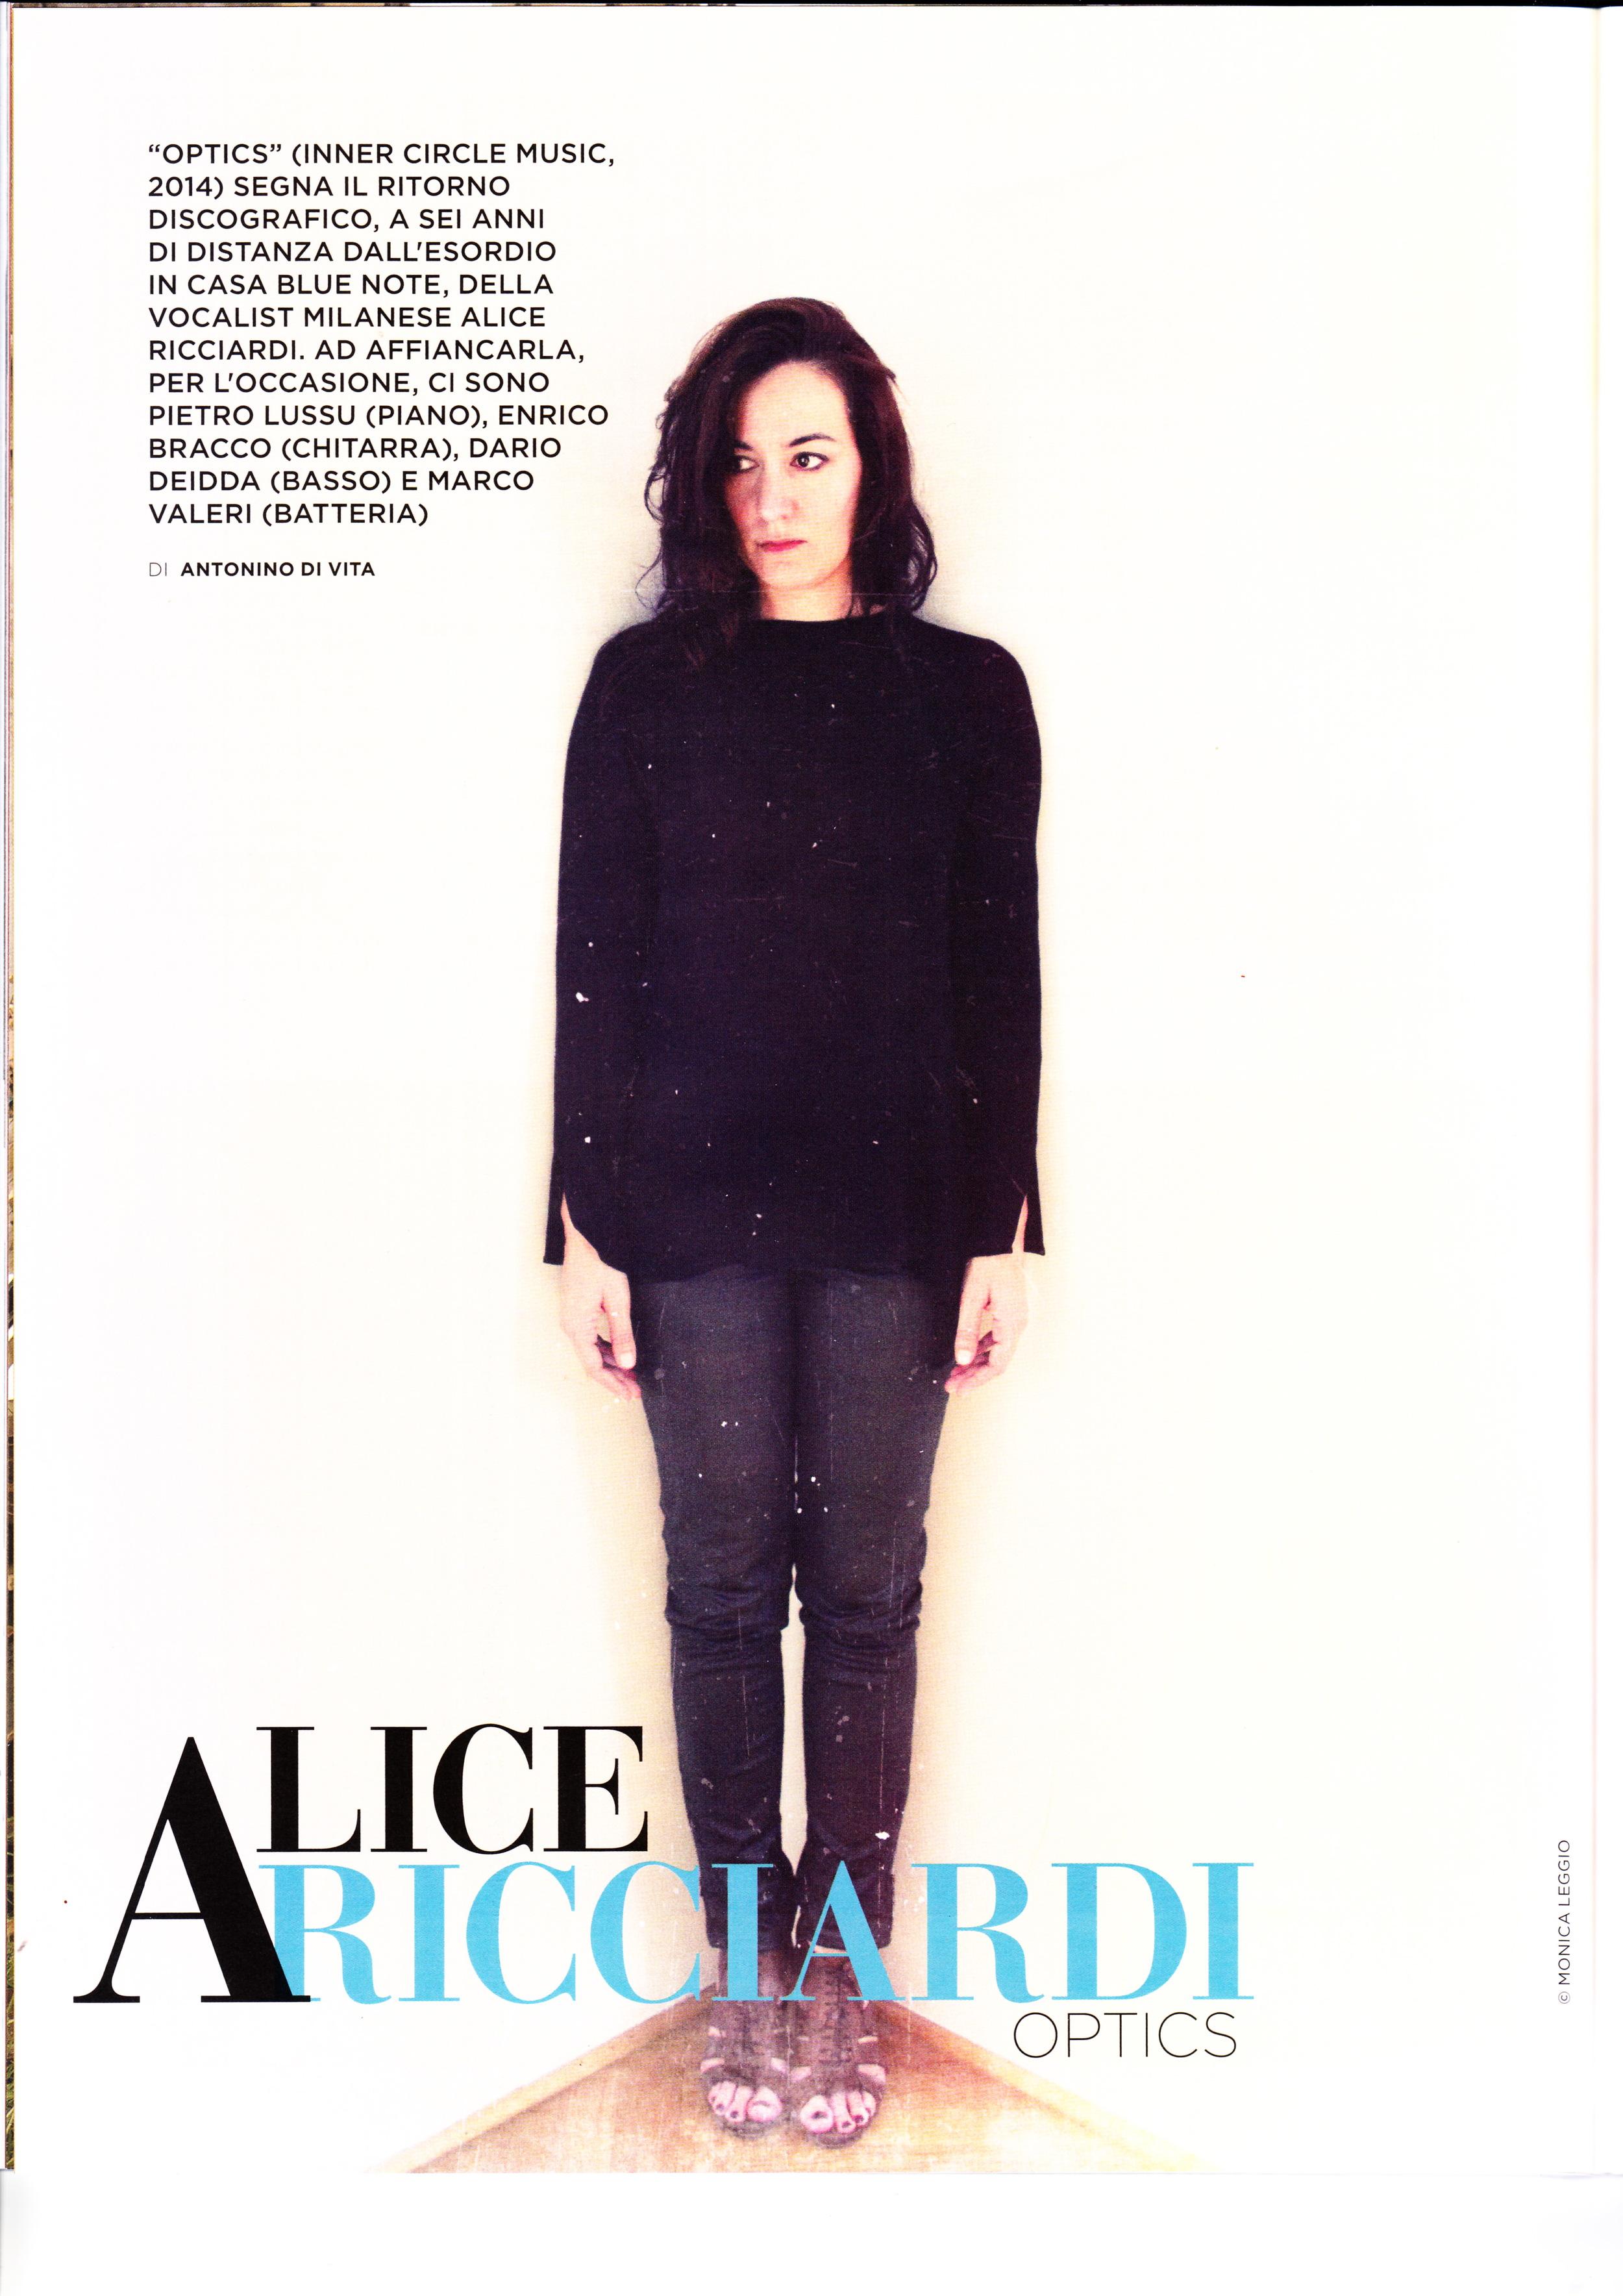 Interview on JAZZIT Magazine